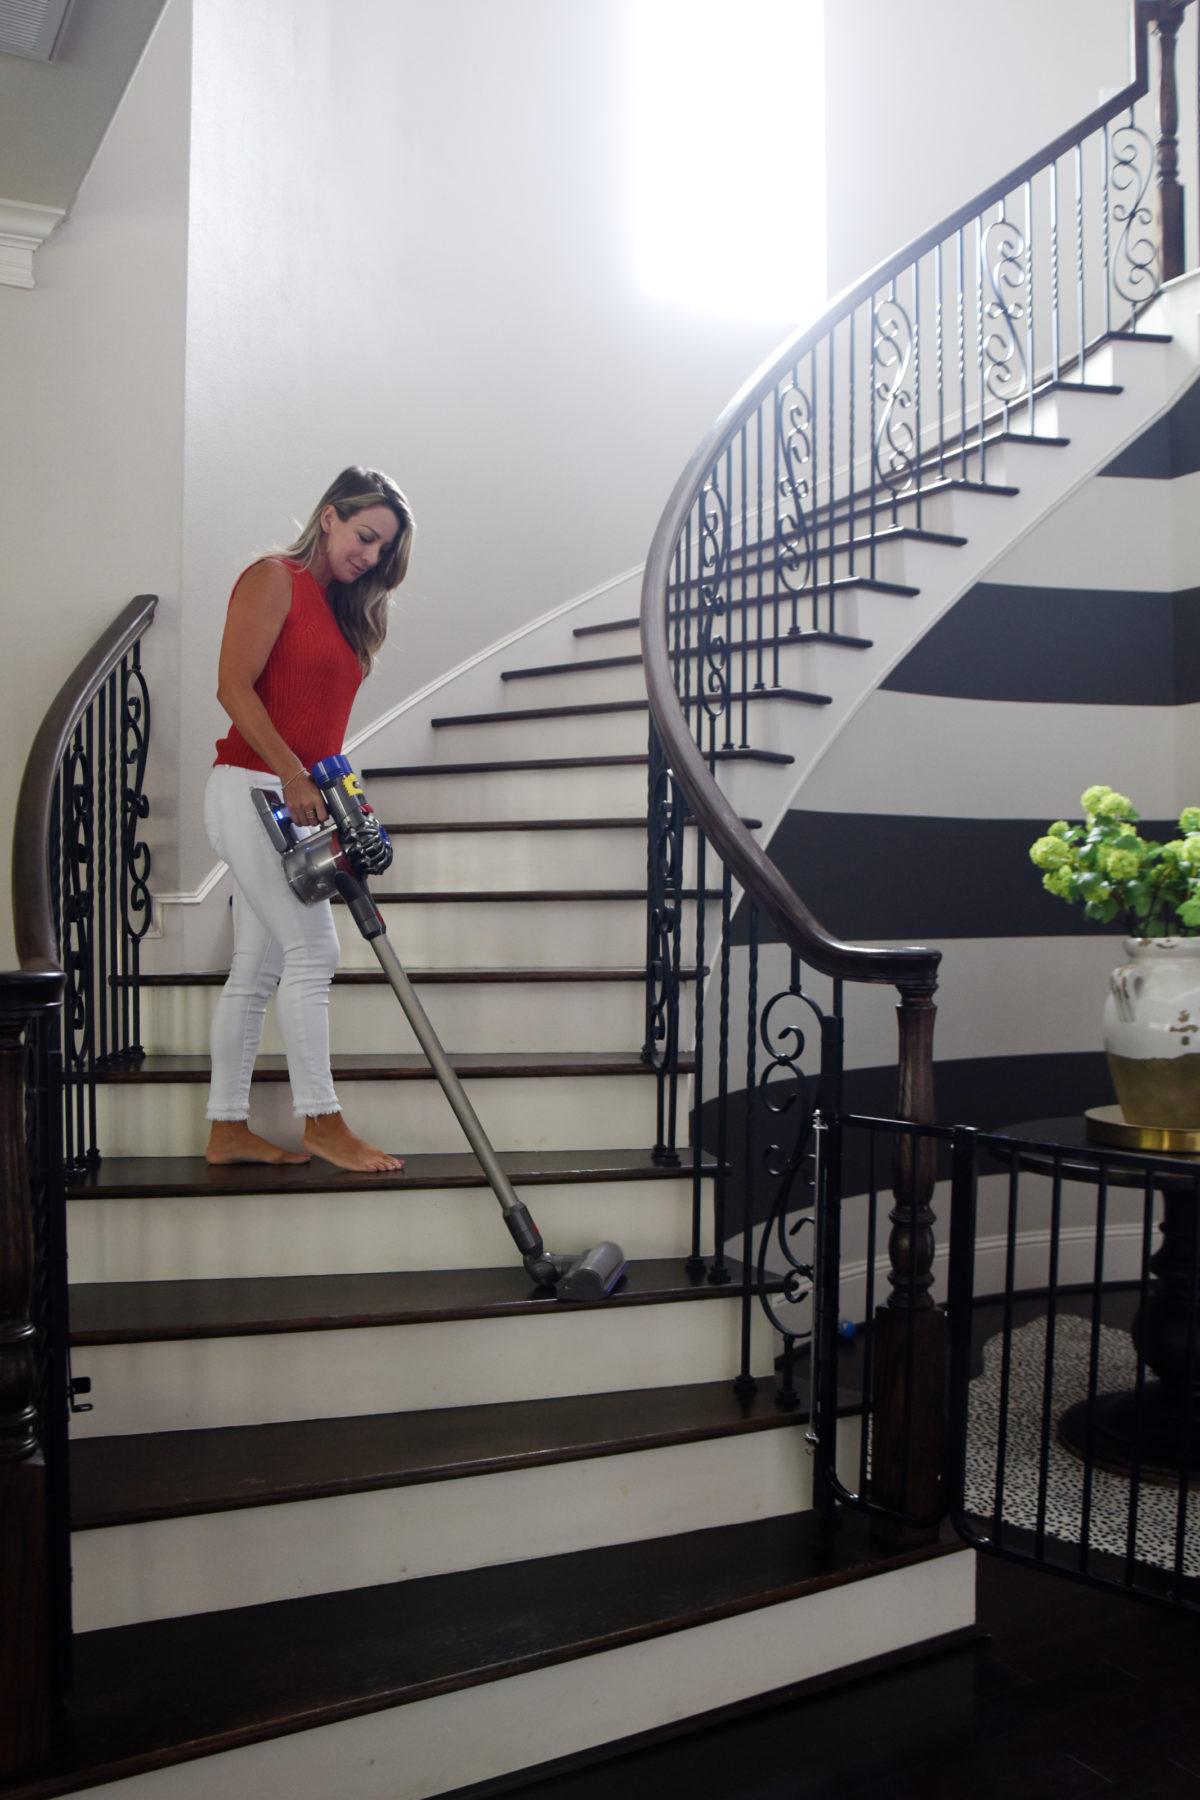 Dyson cordless stick vacuum